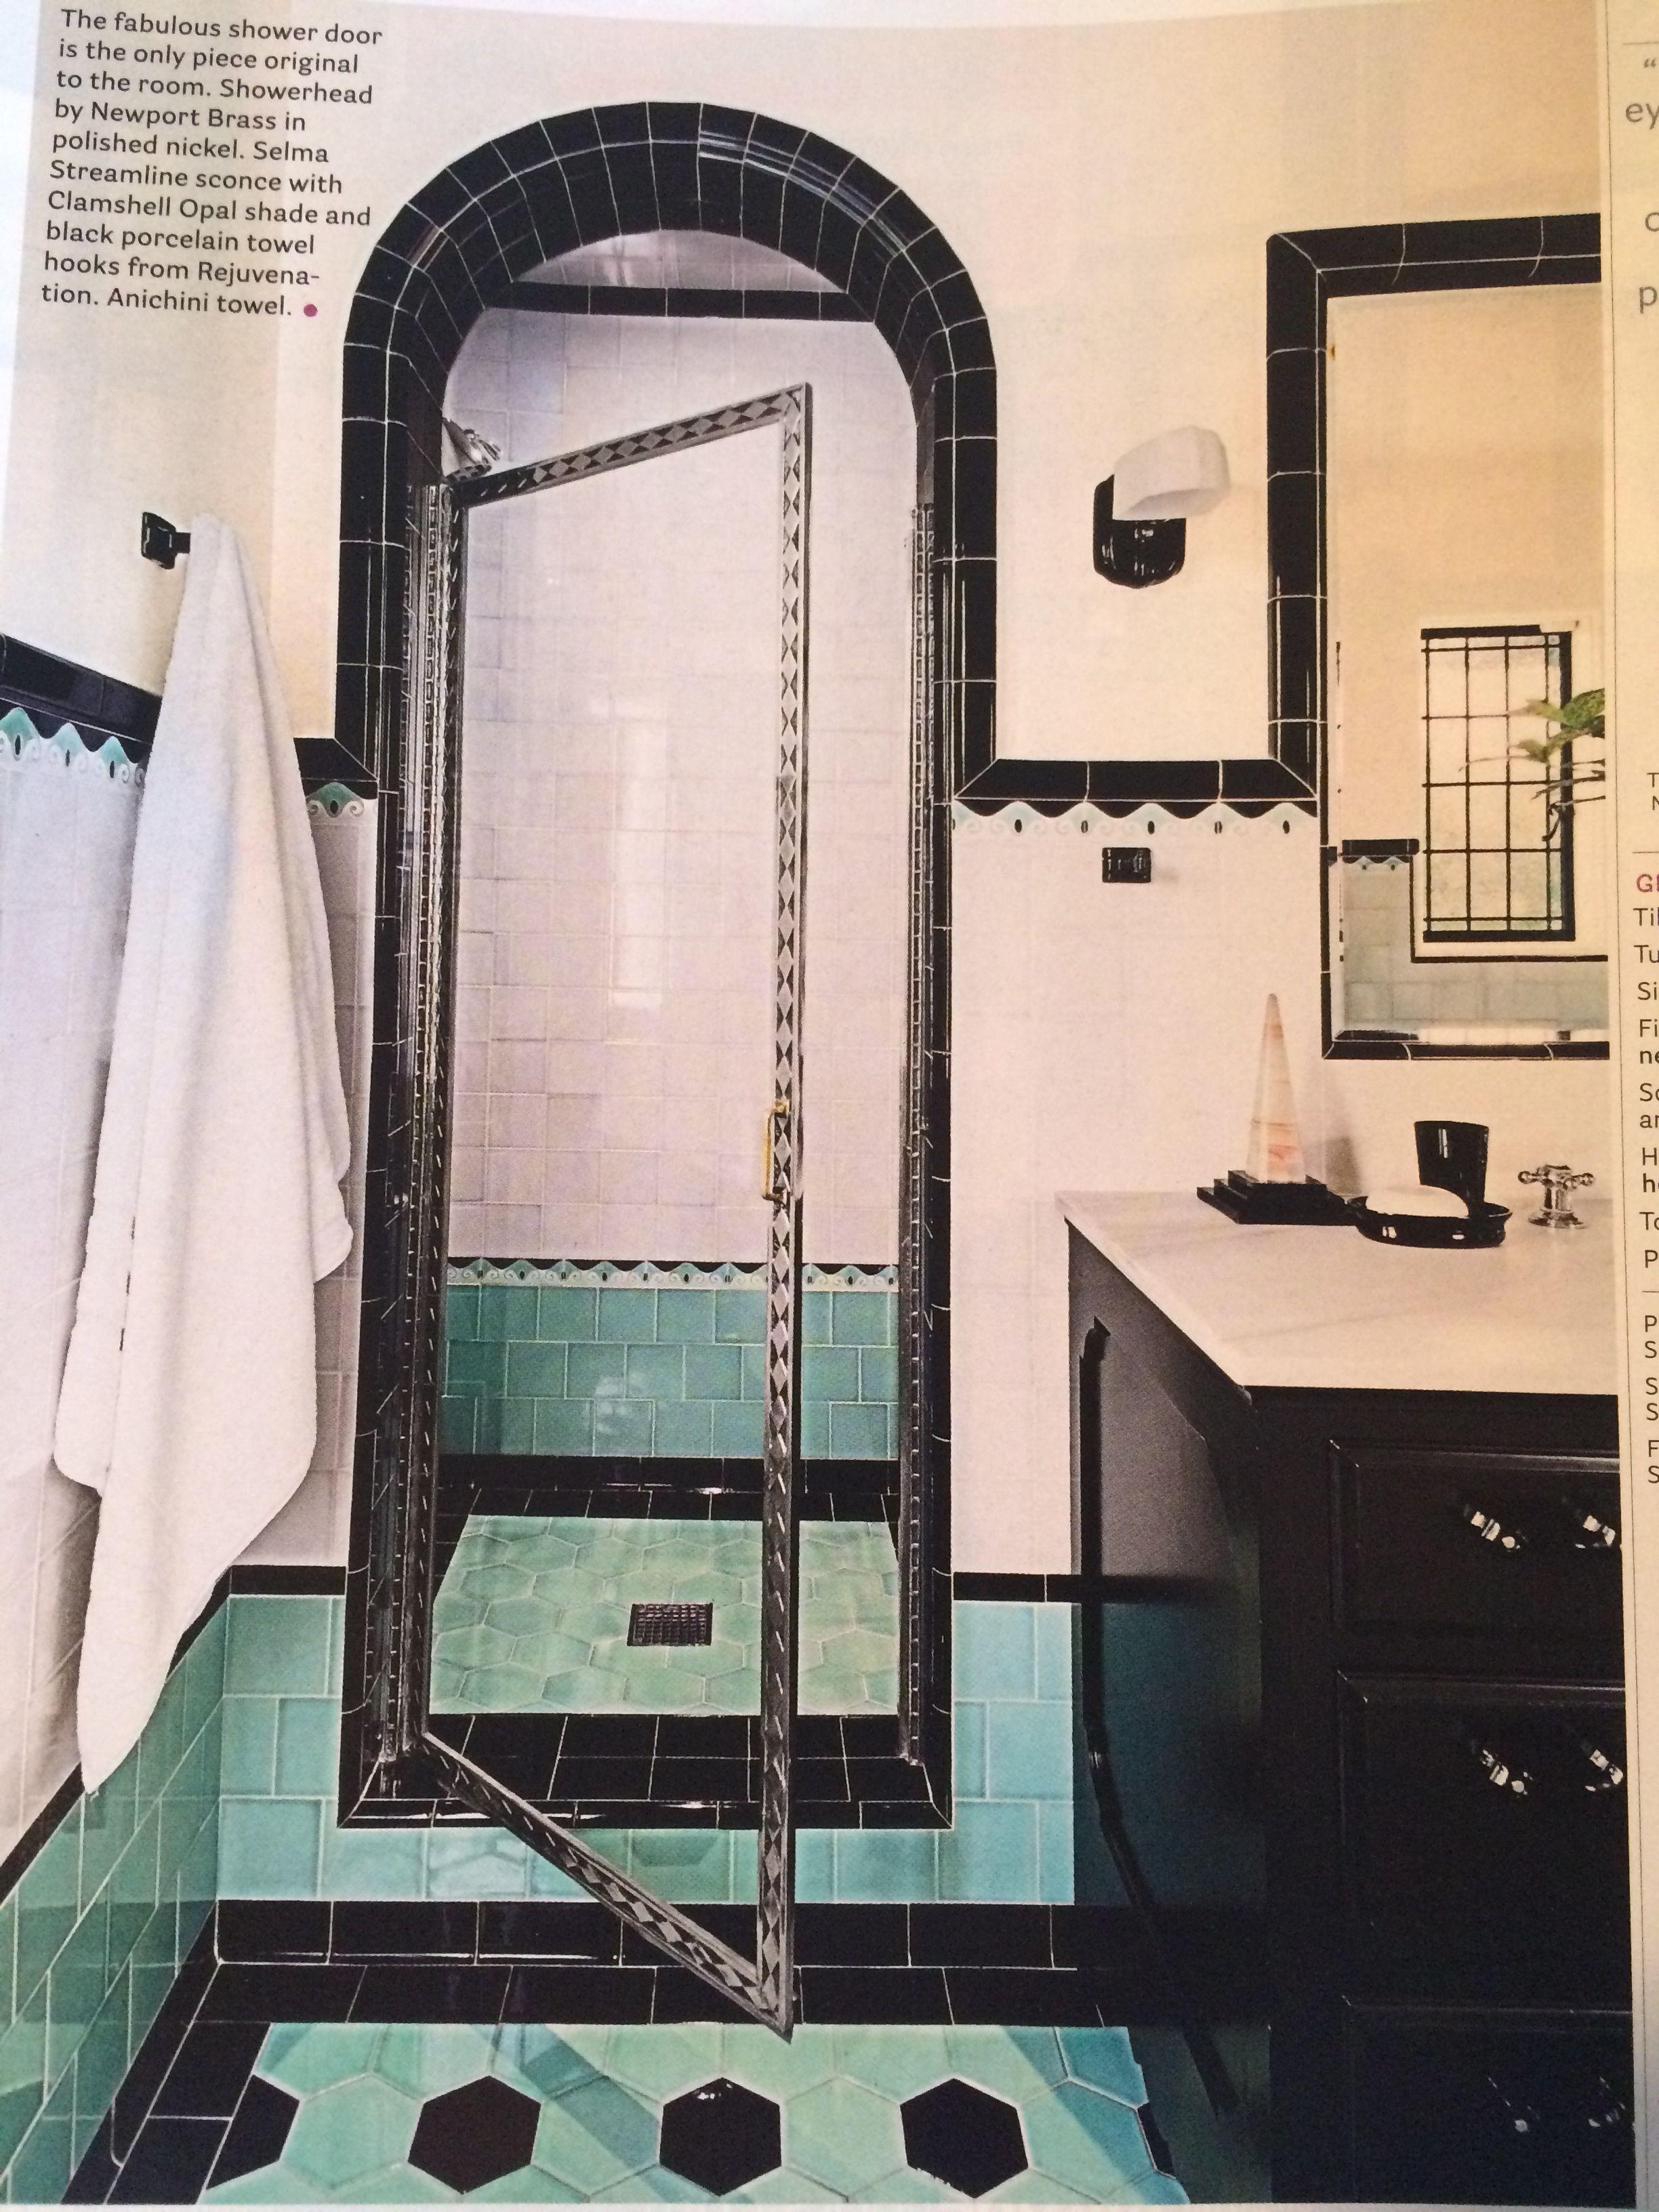 Modernes badezimmerdekor 2018 shower head newport brass in polished nickel hooks rejuvenation